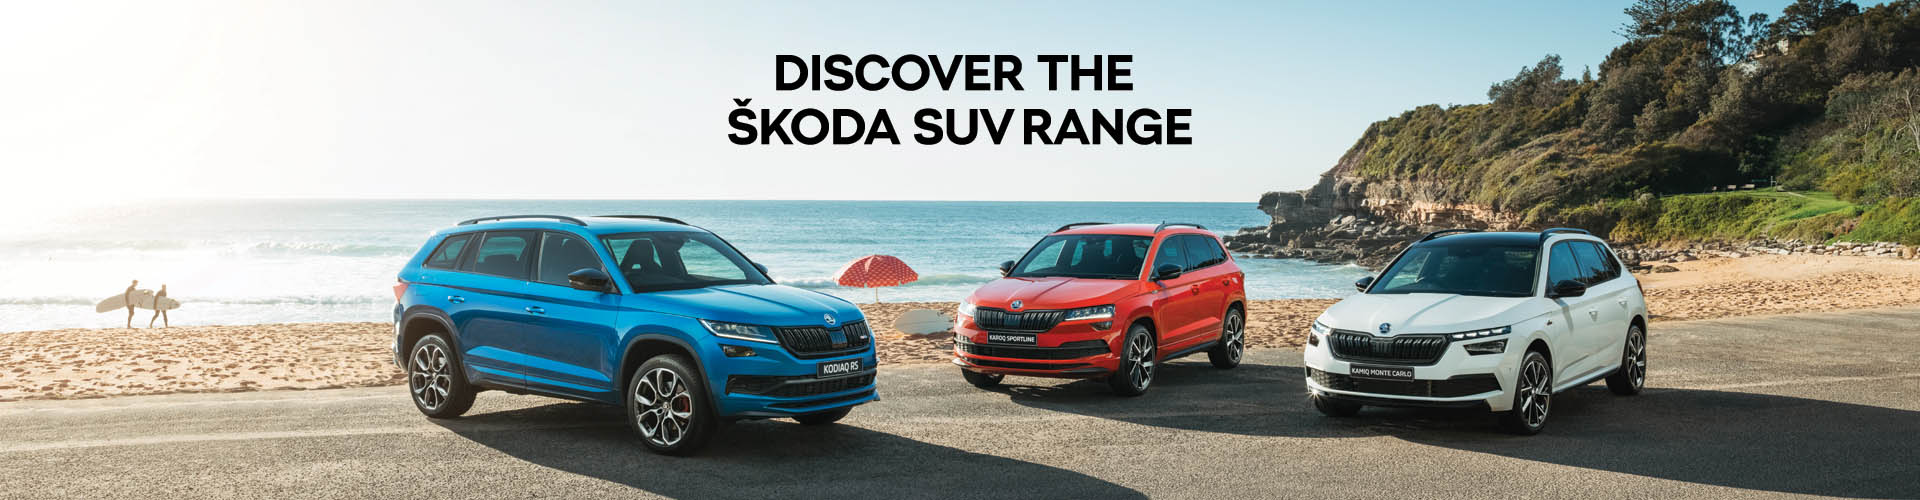 Skoda SUV Range